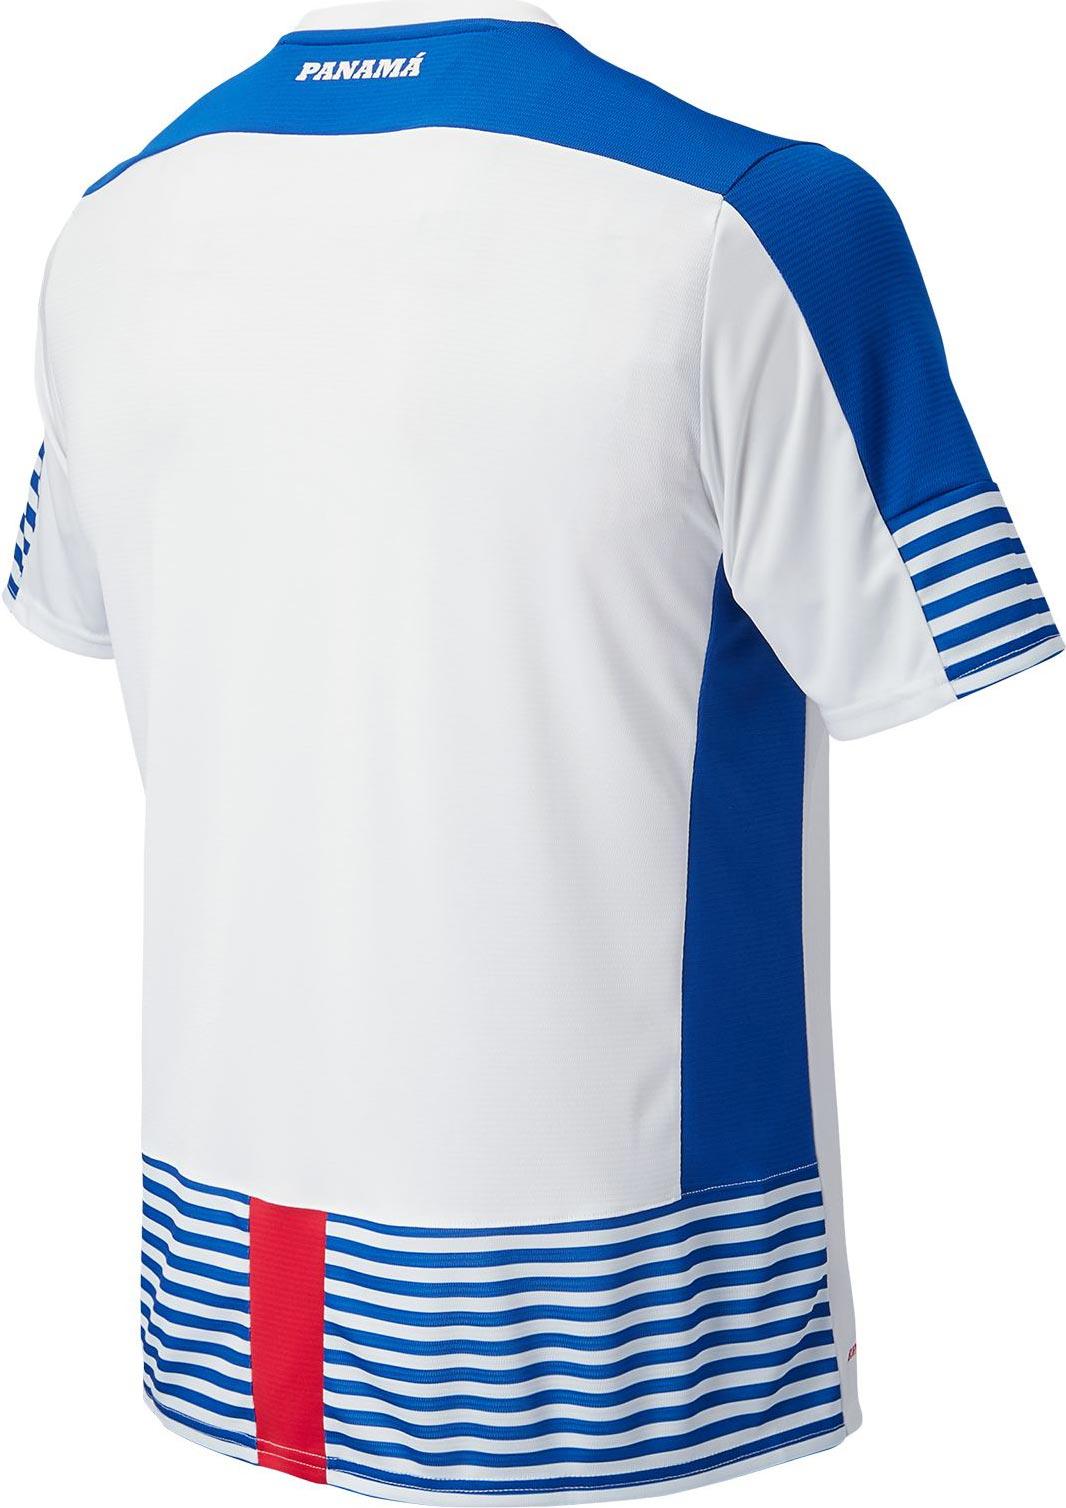 panama-2018-world-cup-qualifiers-kits-away-back